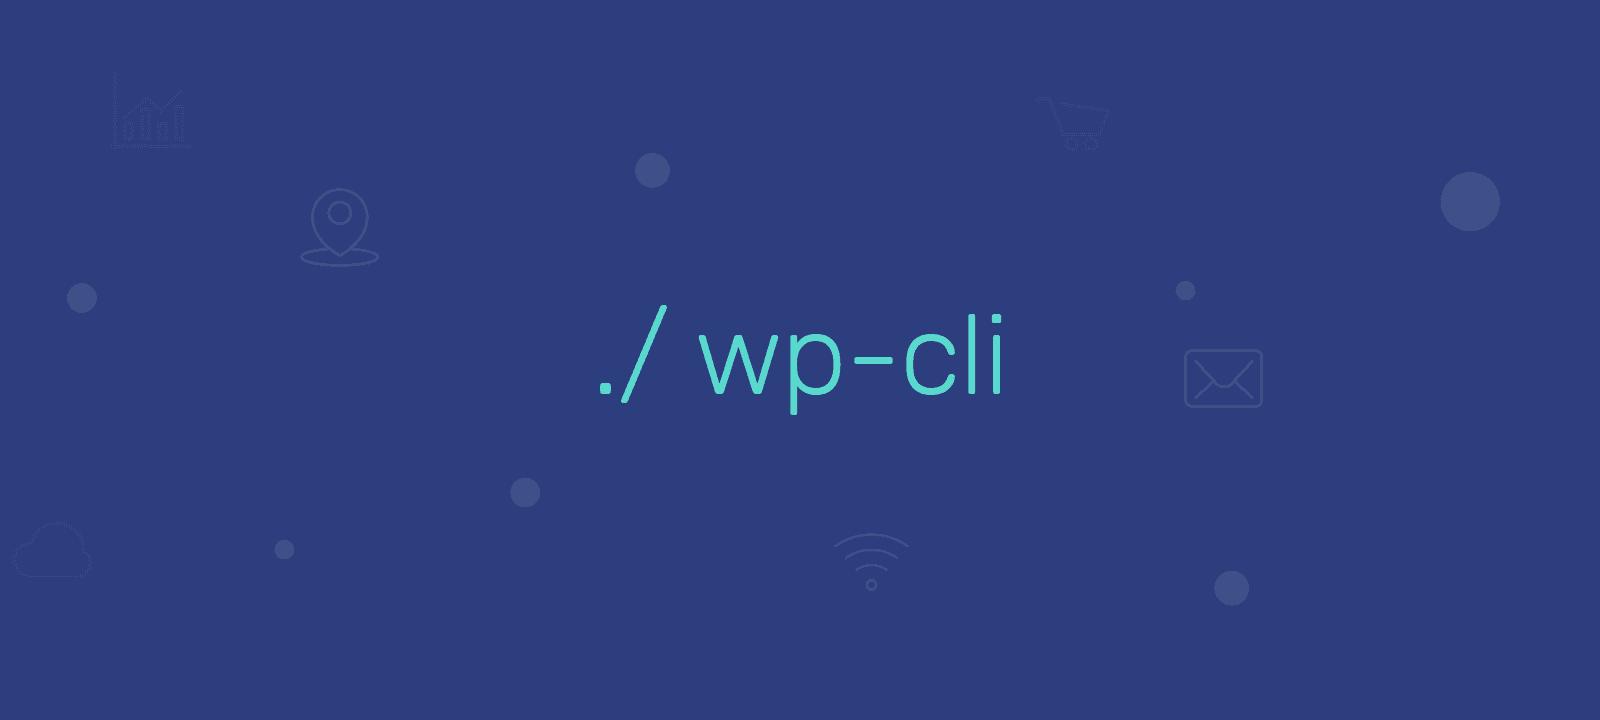 wp-cli wordpress shell terminal console